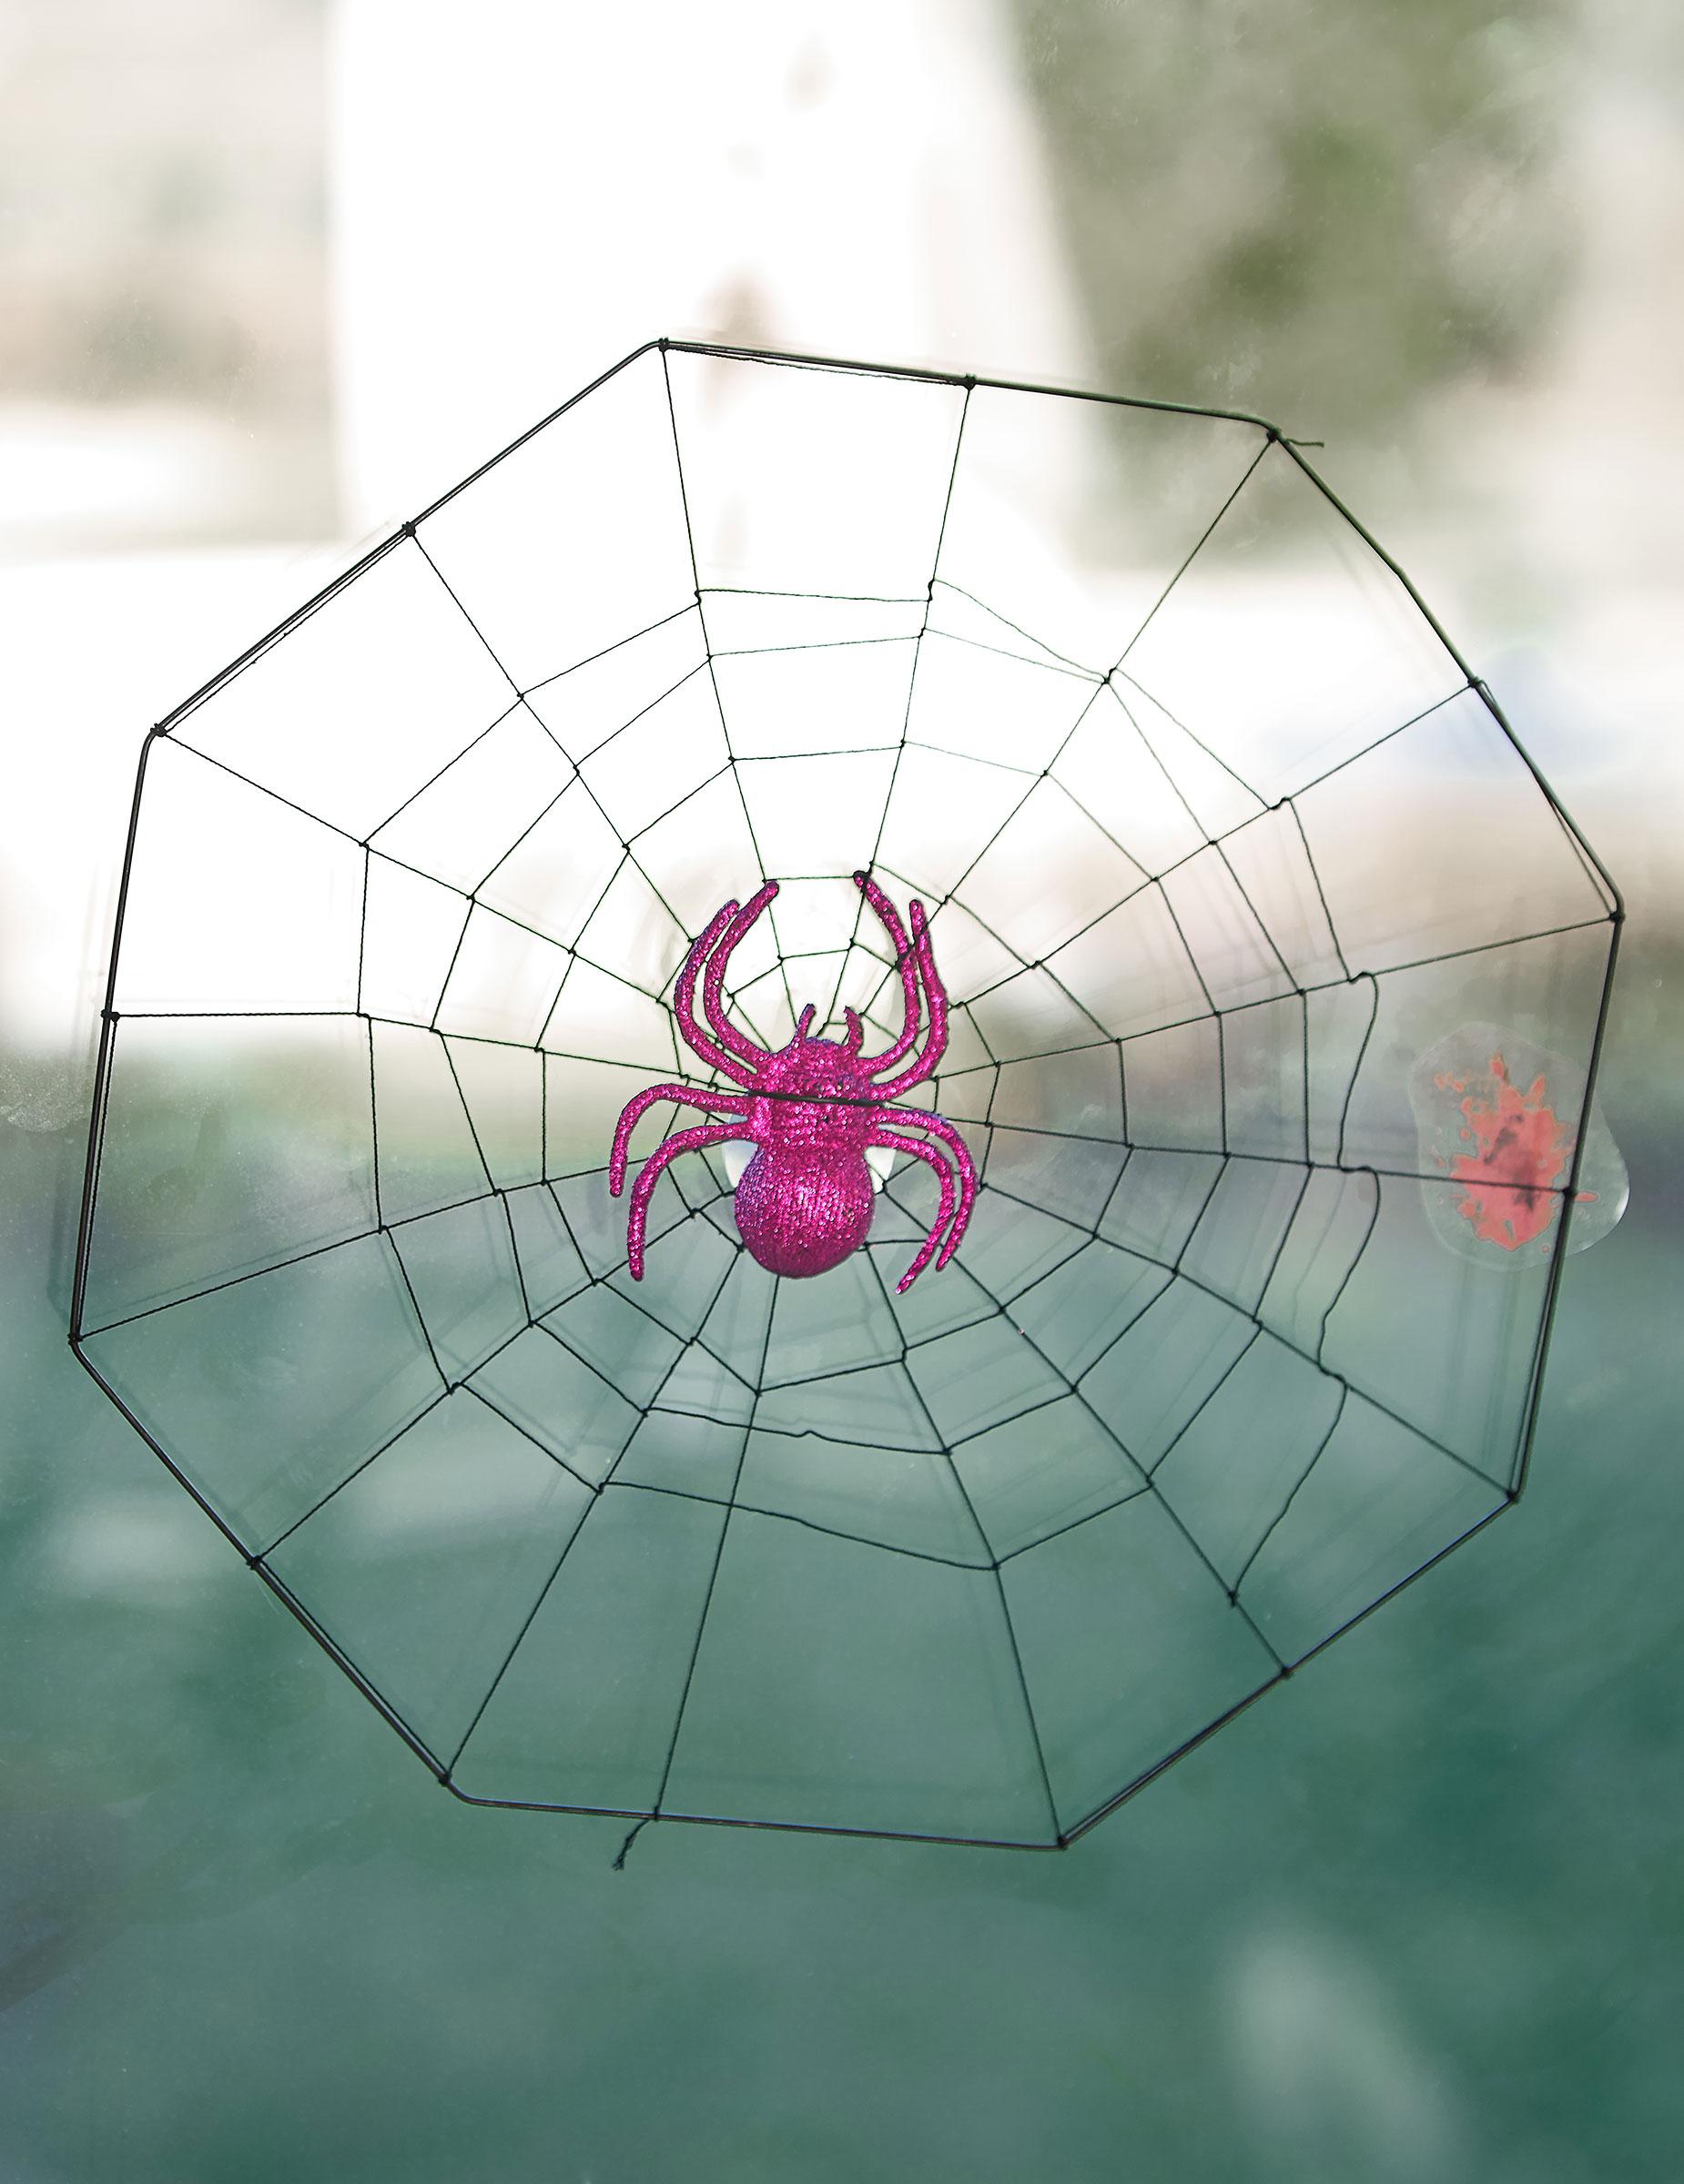 Toile d 39 araign e ventouse halloween deguise toi achat - Maquillage toile d araignee ...